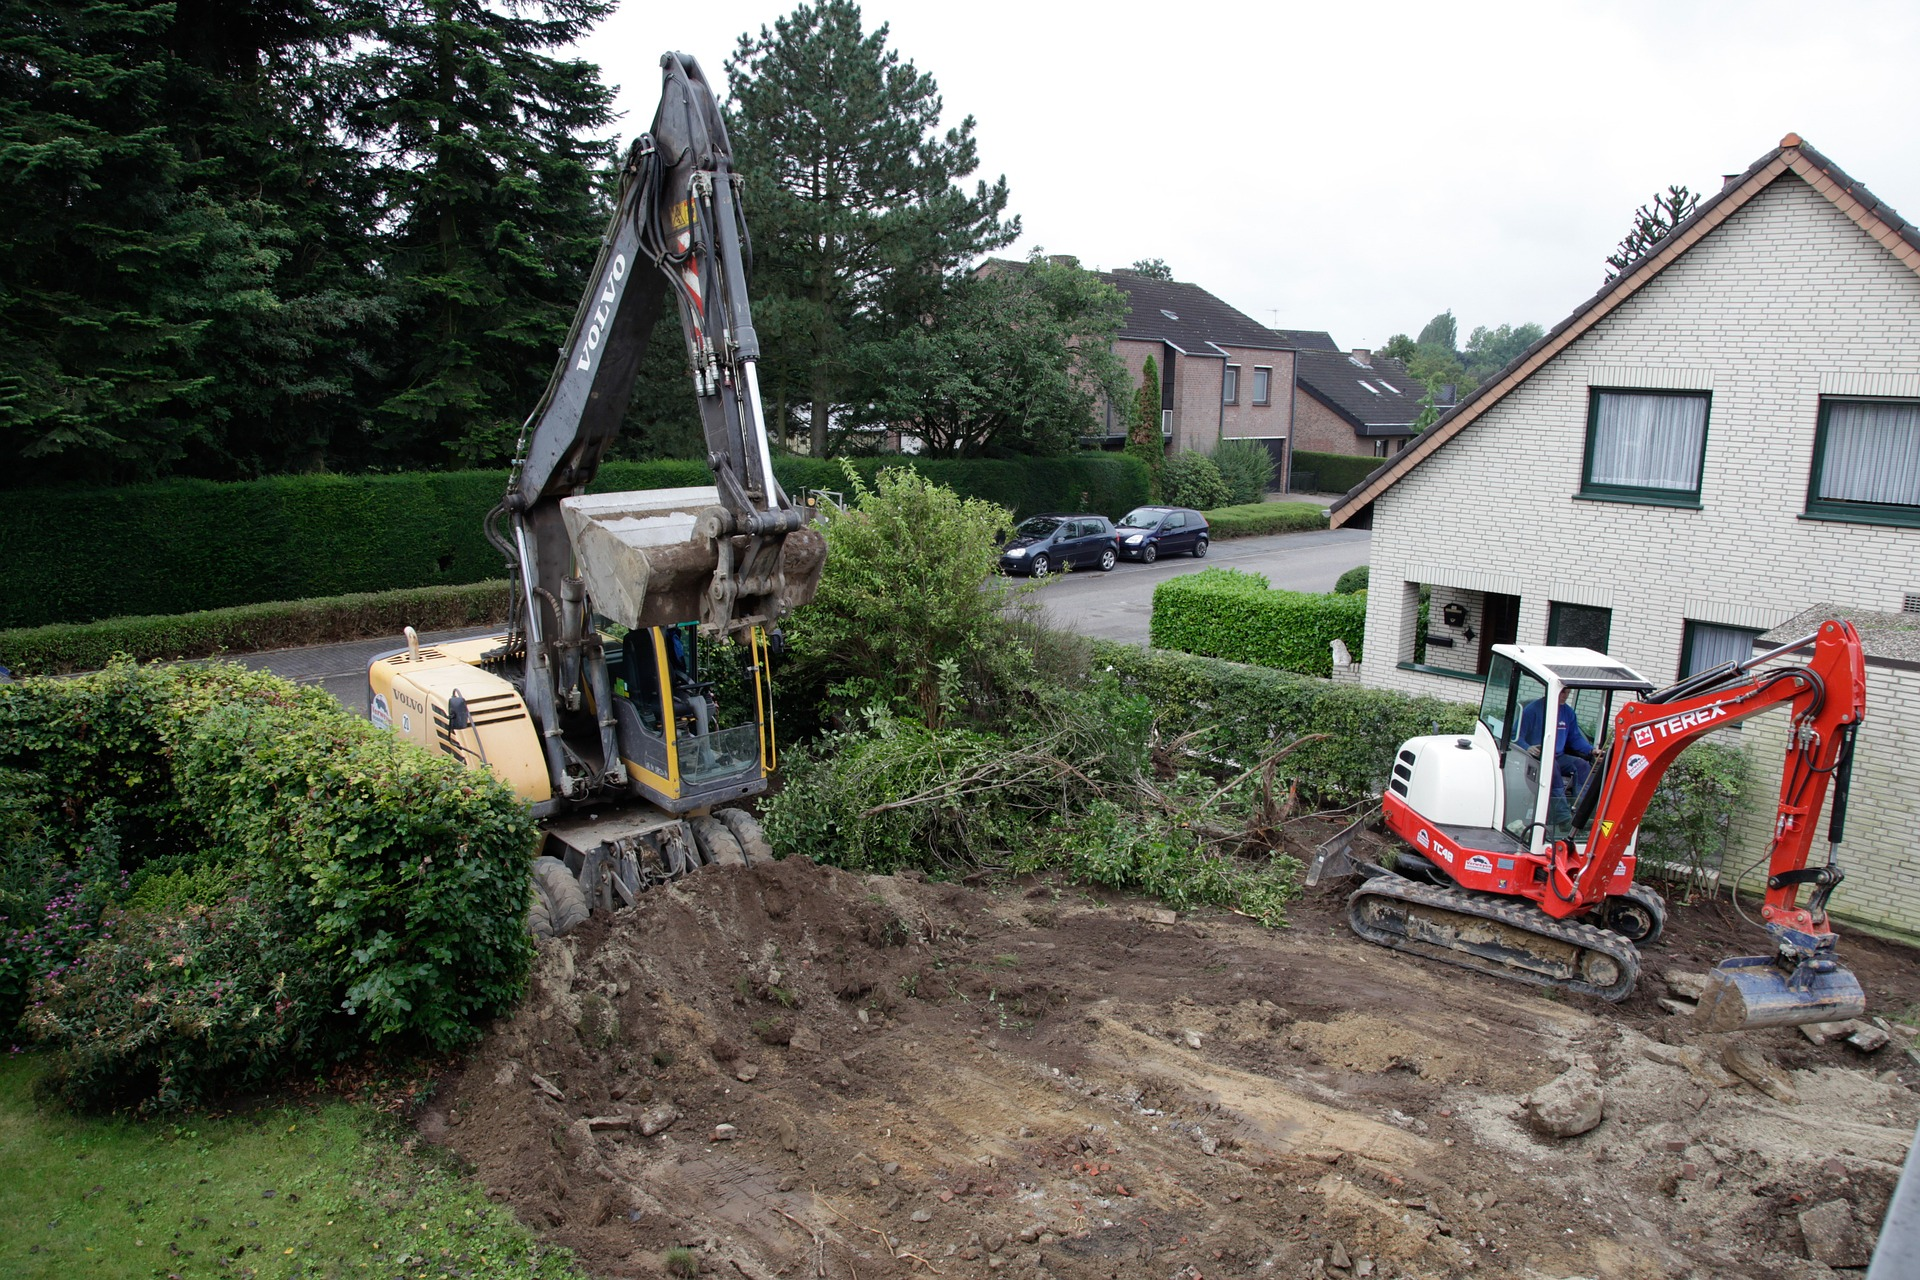 construction-work-2698790_1920